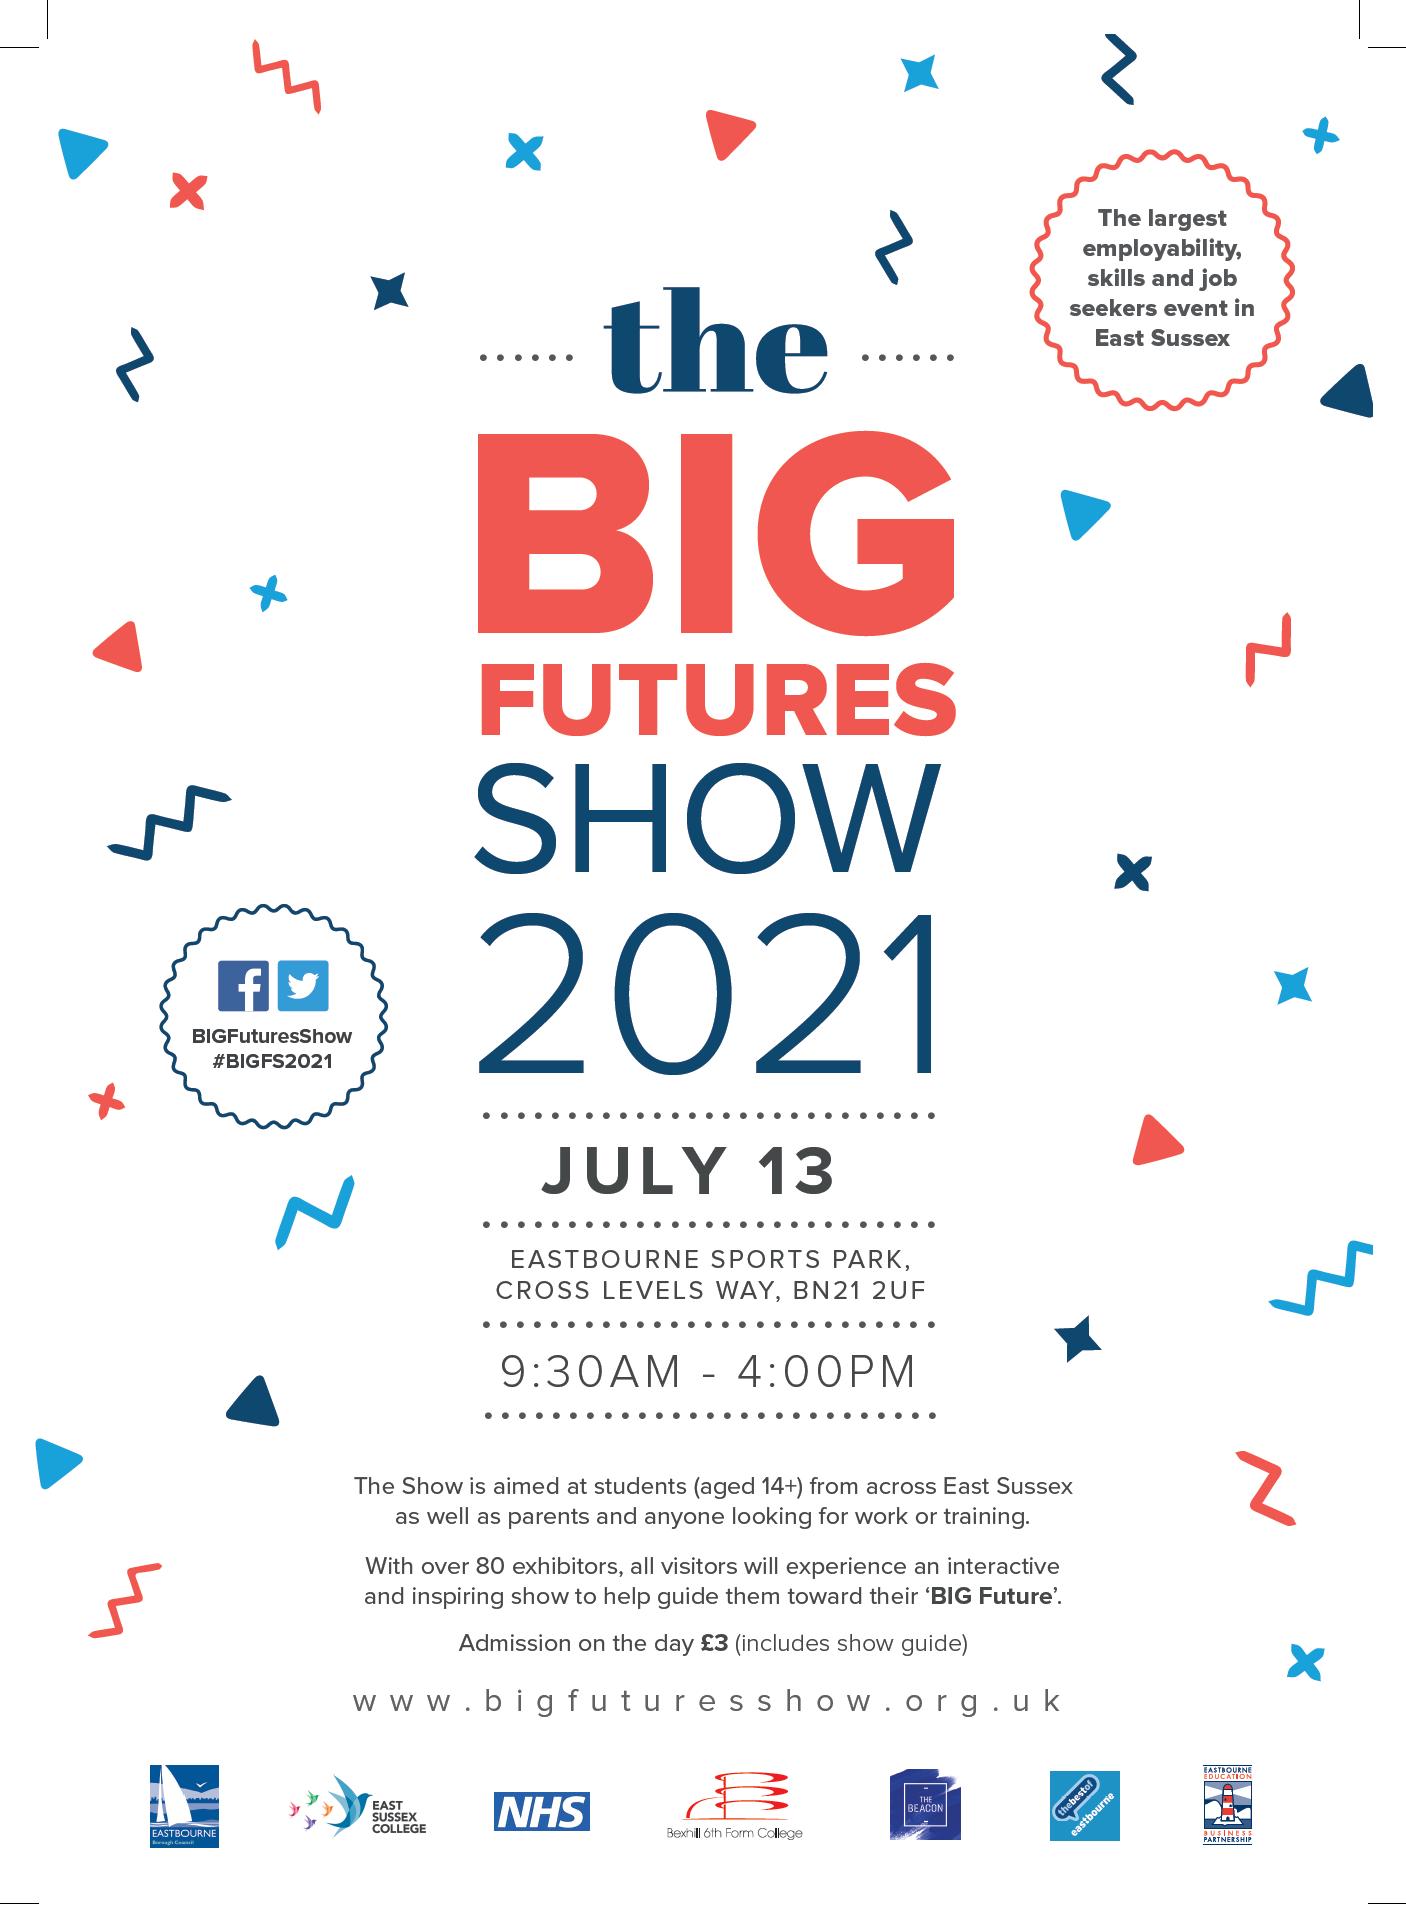 The Big Futures Show 2021